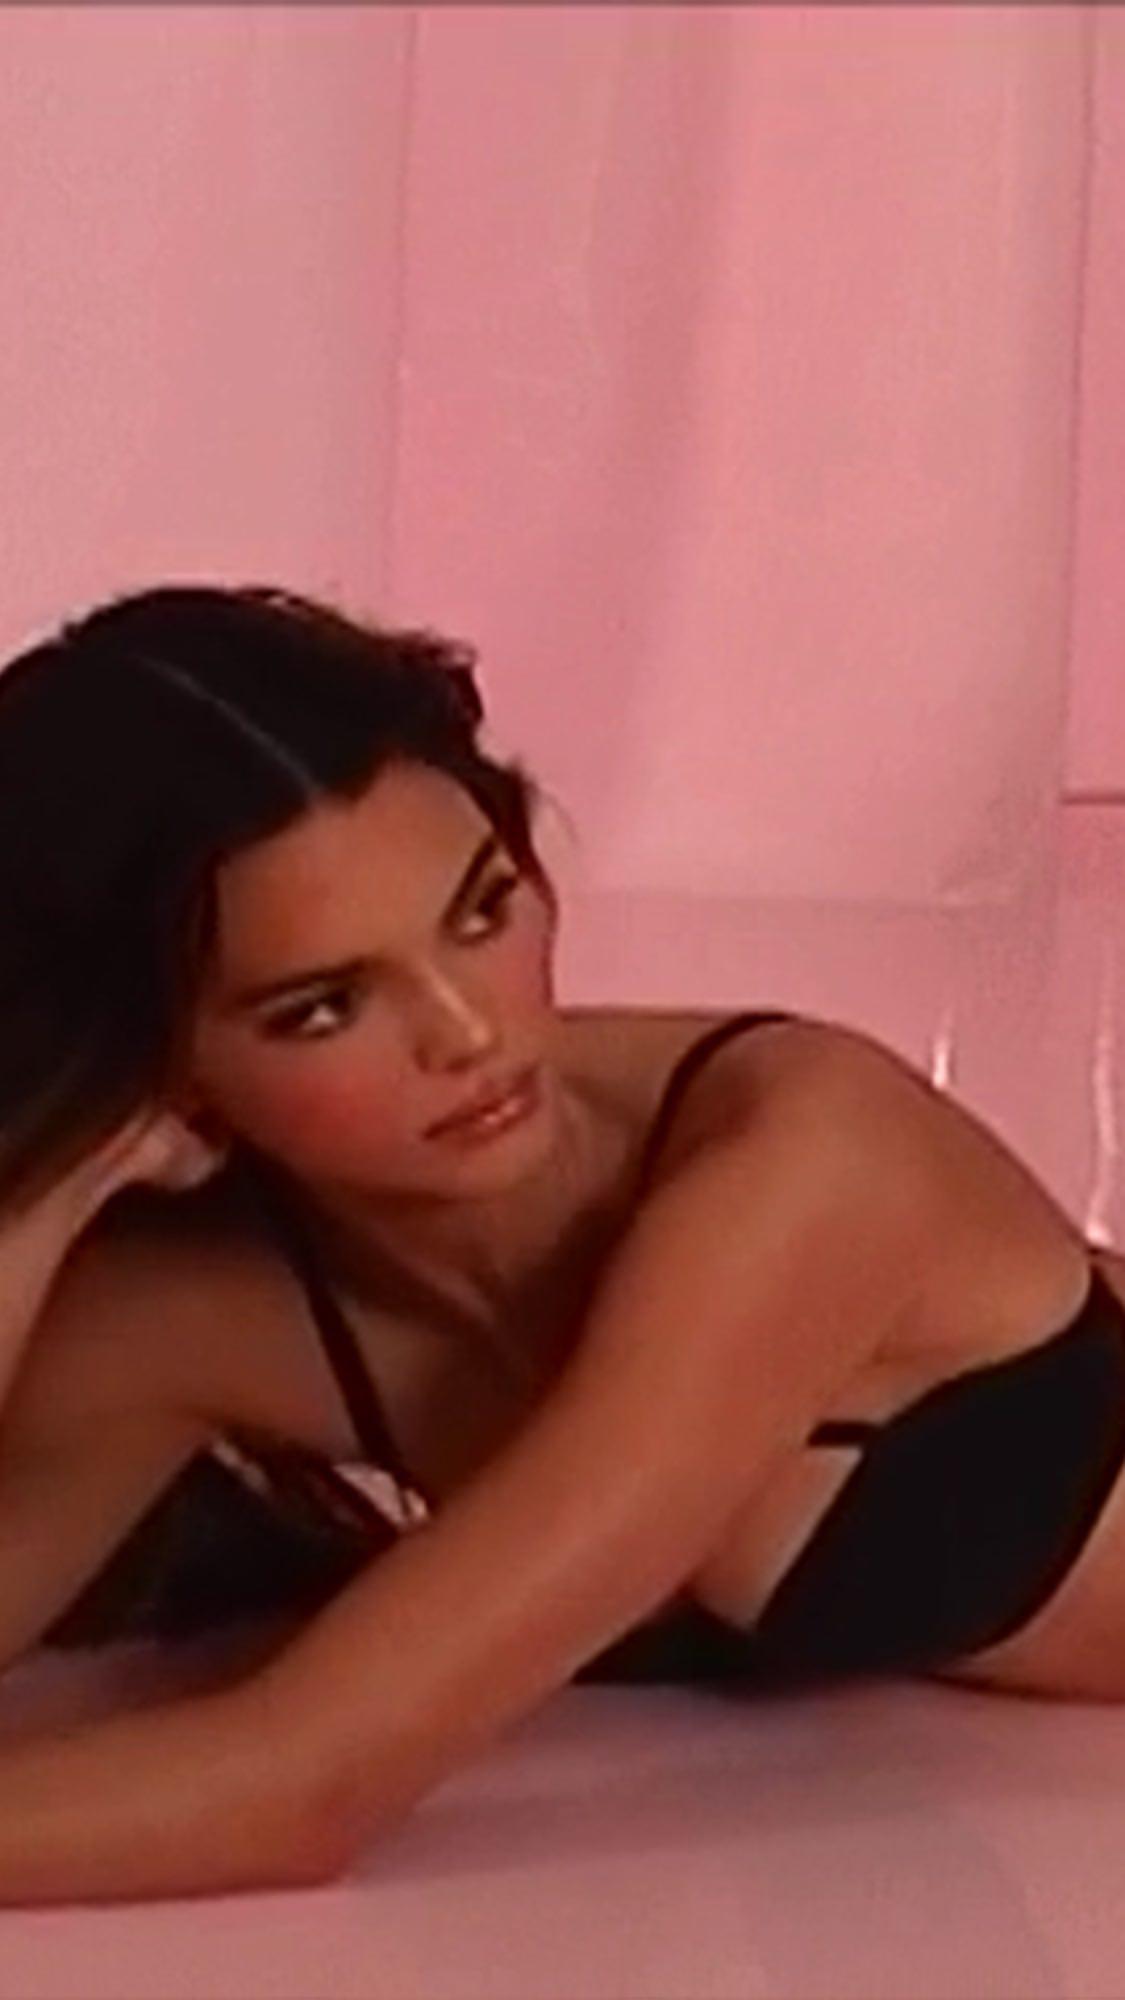 Kendall Jenner Skims Thong Photoshoot Leaked Neawff